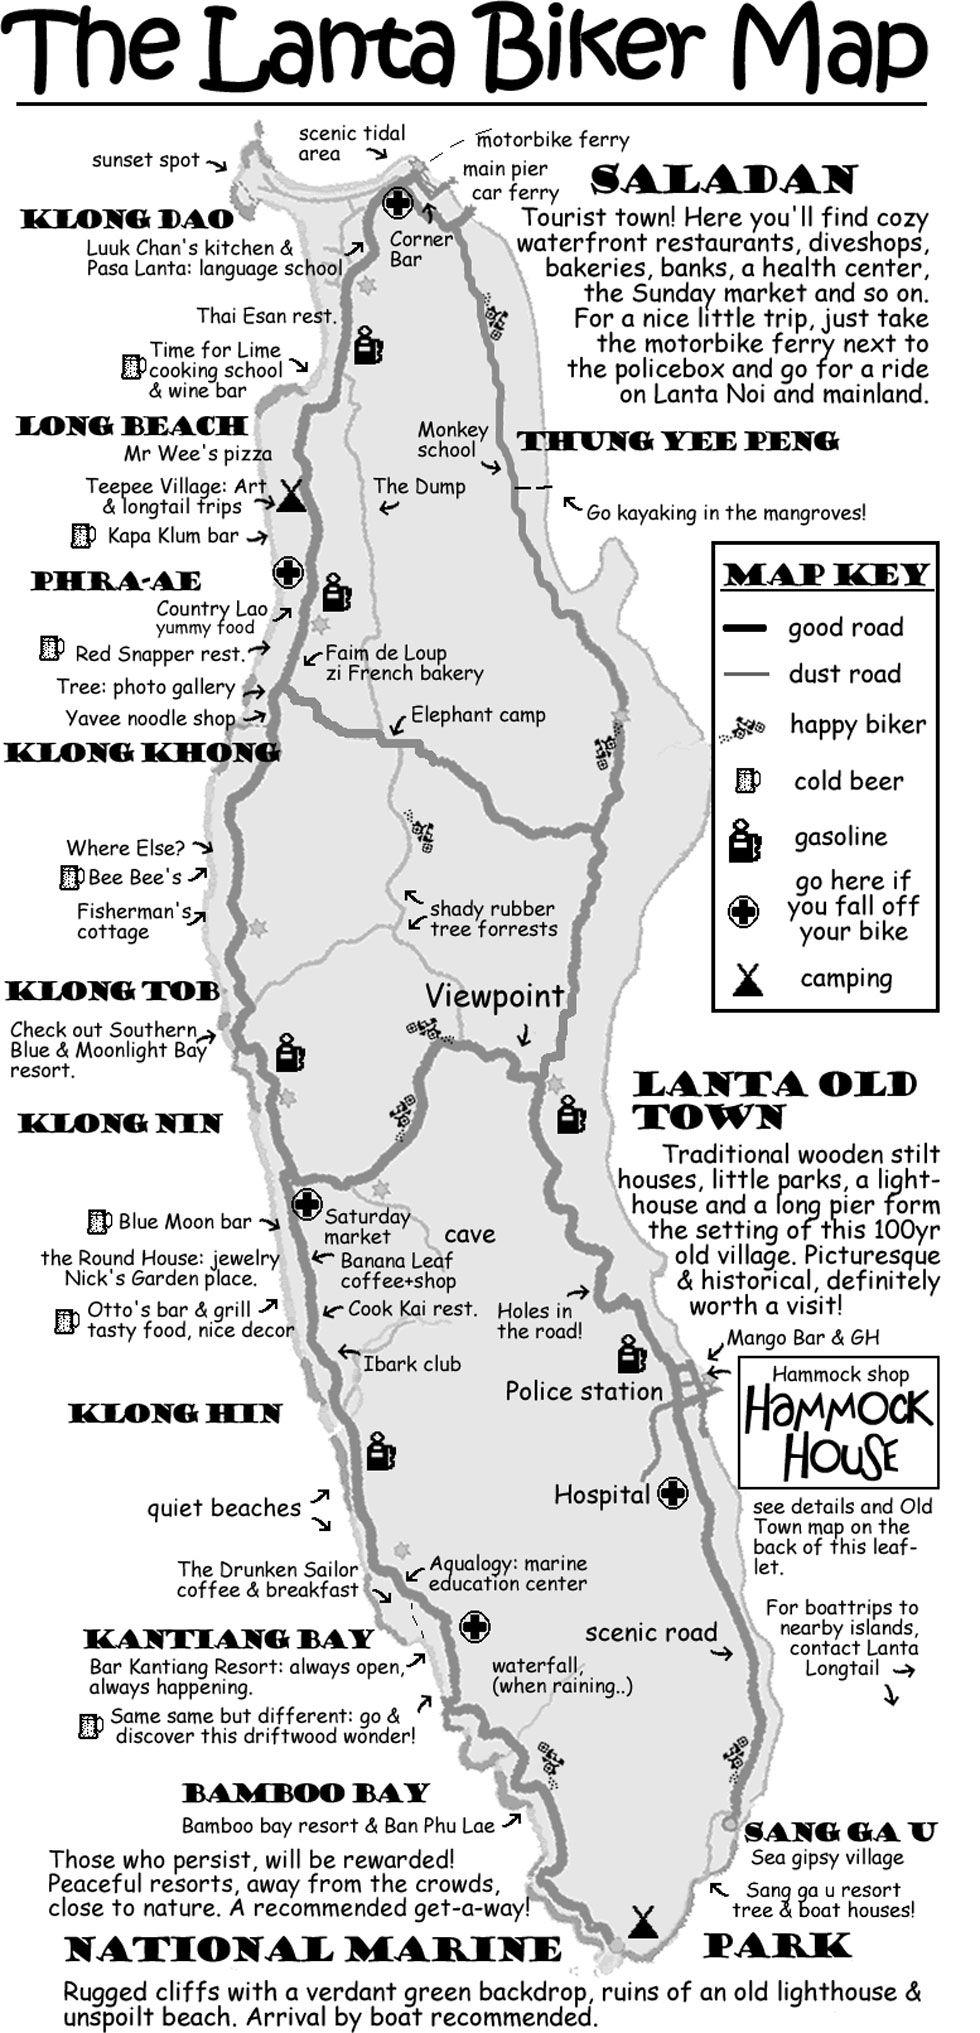 The Lanta Biker Map is an alternative map of Lanta